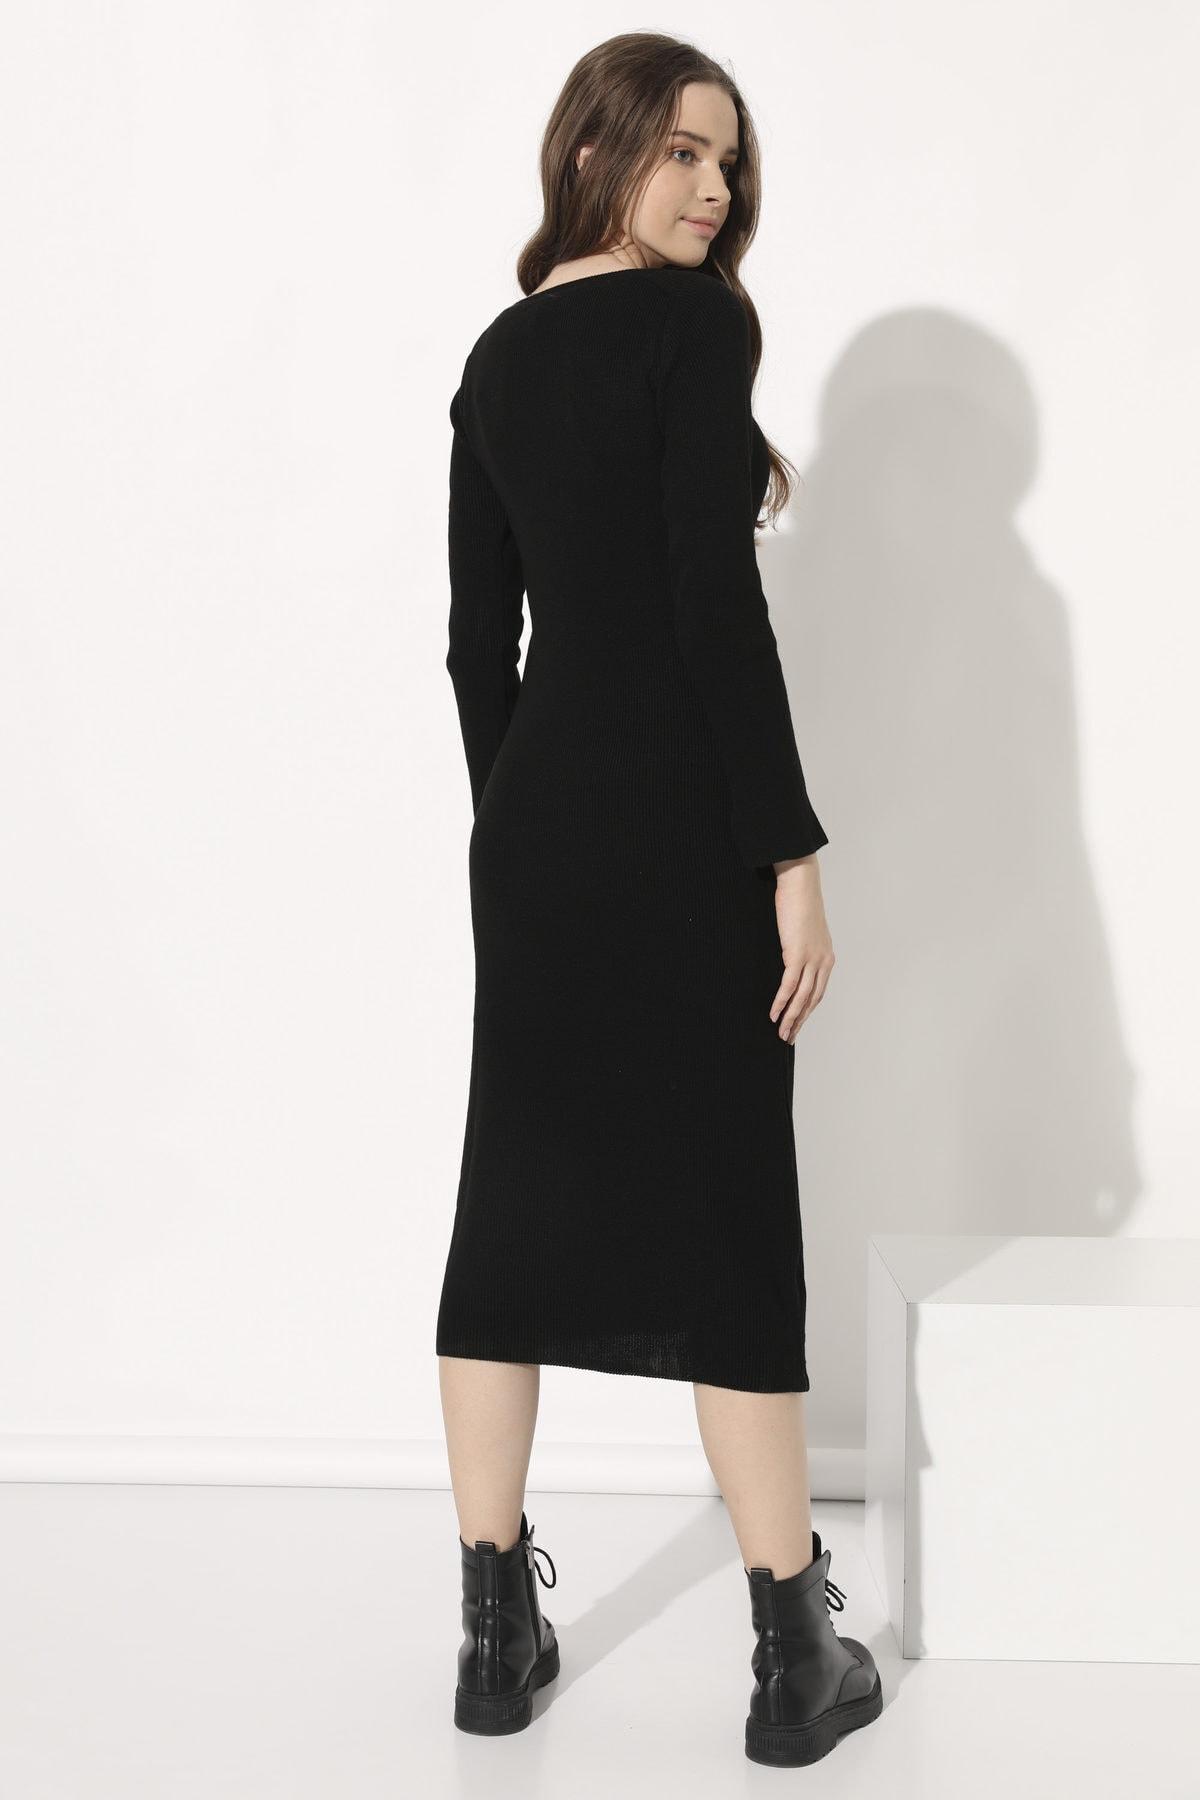 Arma Life Uzun Triko Elbise